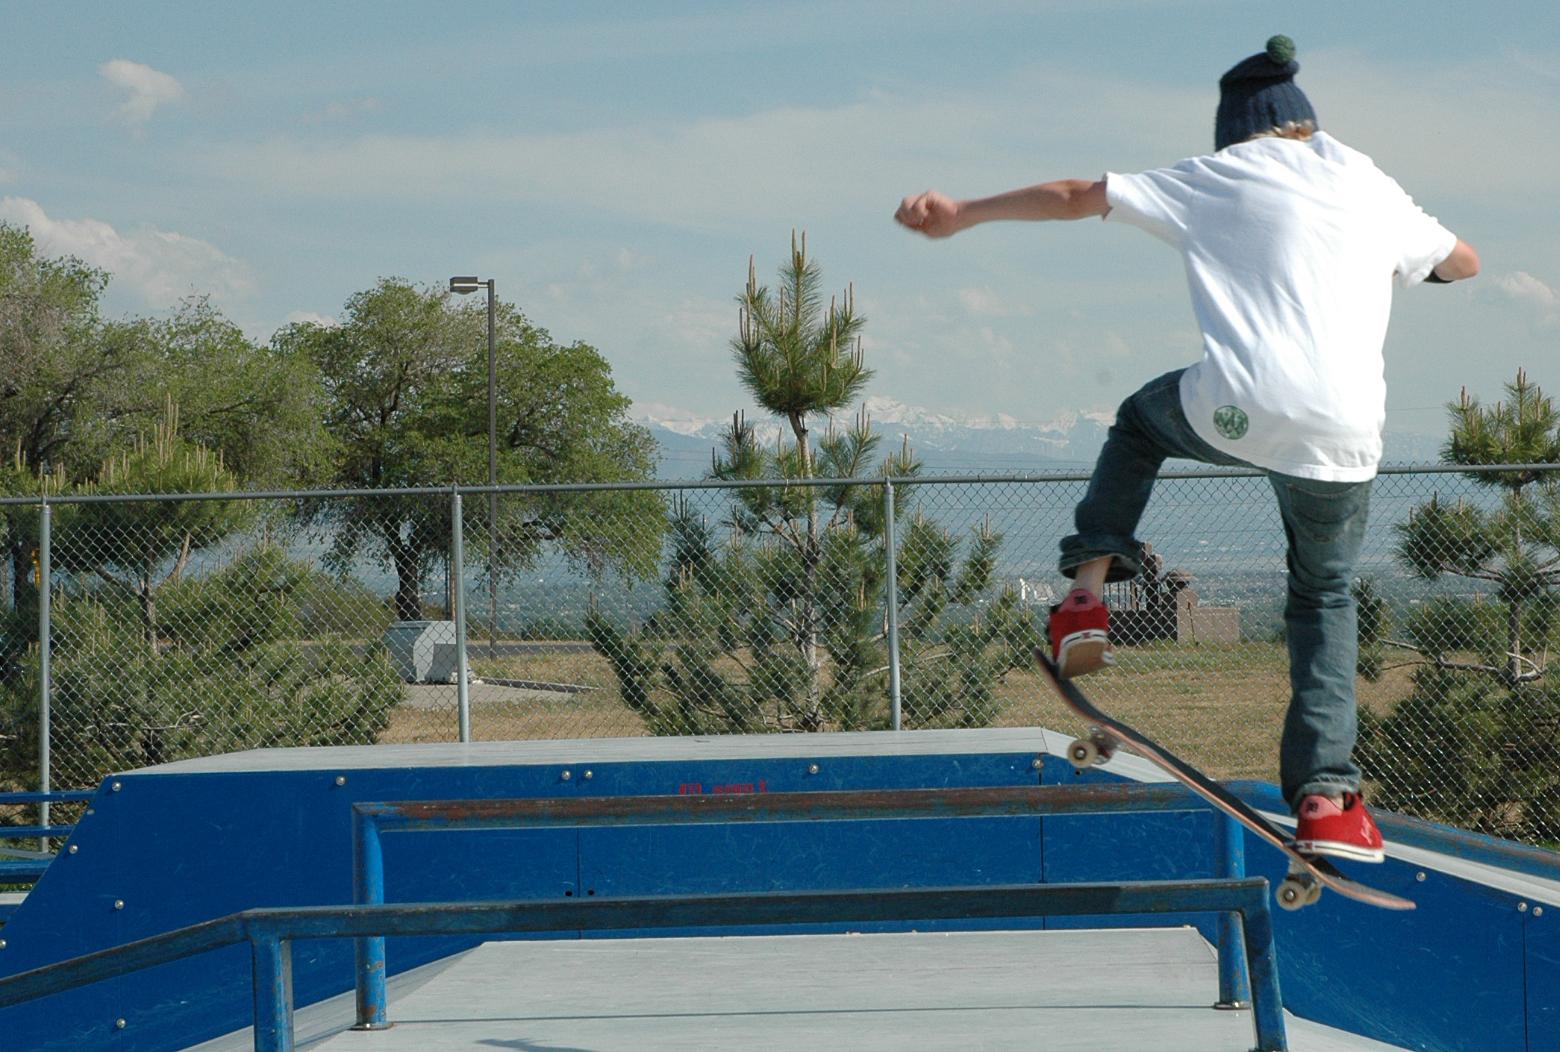 air force 1 skate